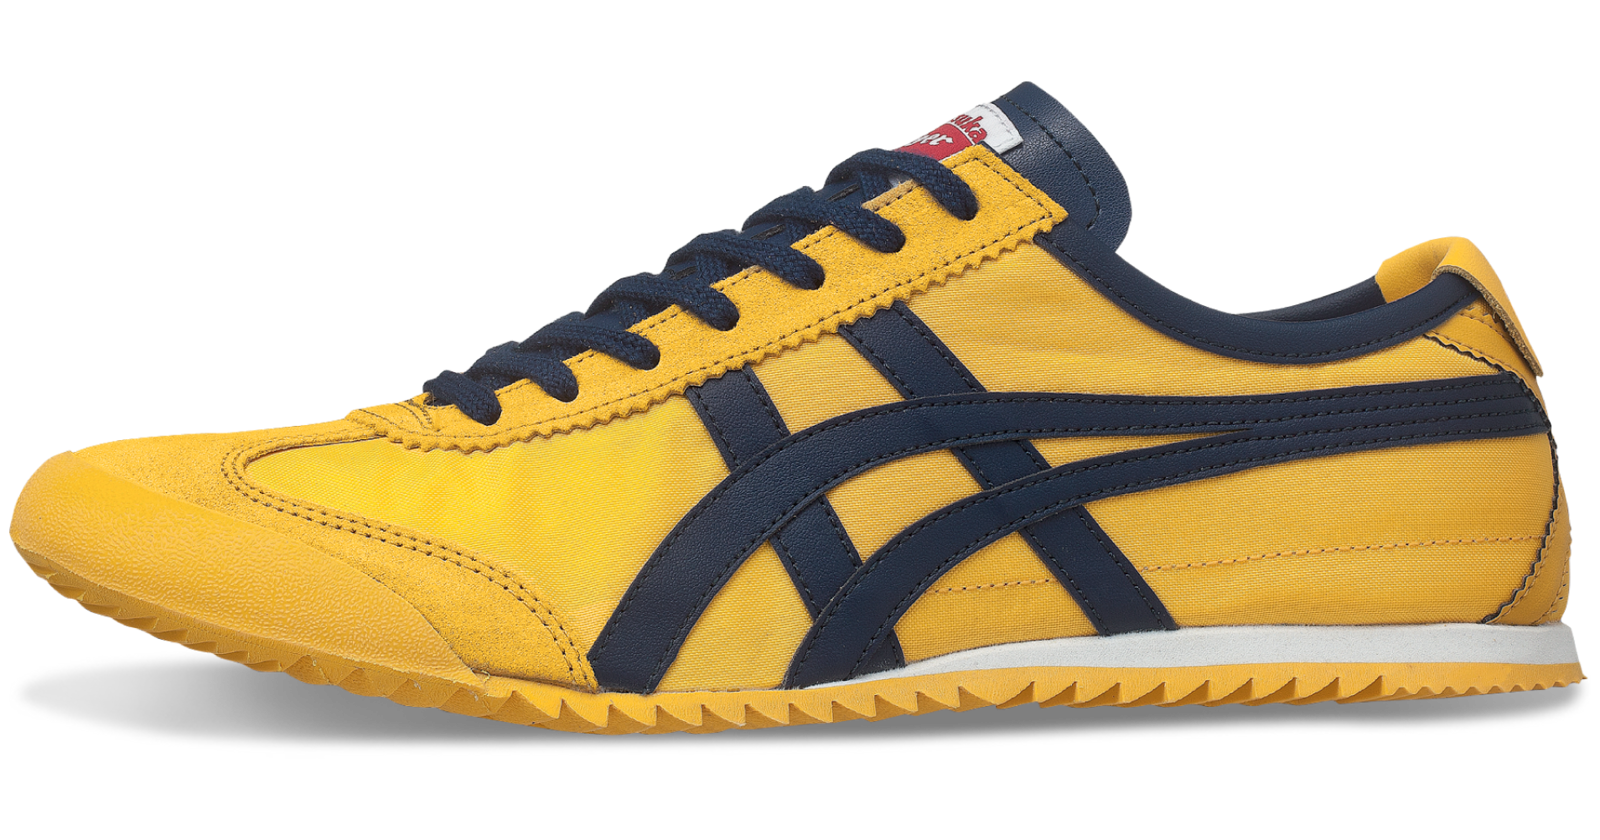 onitsuka tiger mexico 66 shoes online oficial site oficial